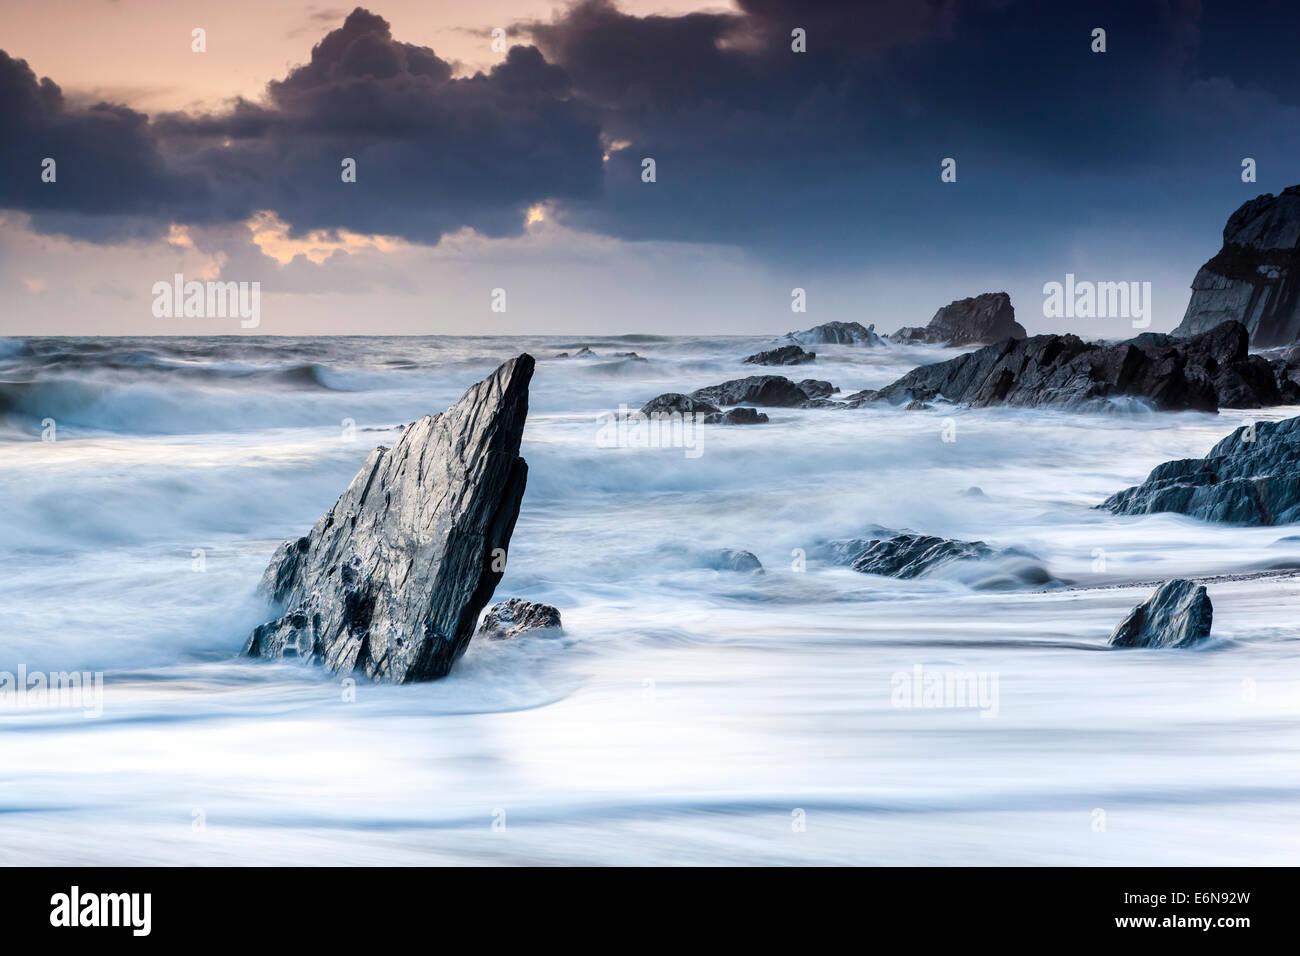 Felsenküste am Ayrmer Cove in South Hams, South Devon, England, Vereinigtes Königreich, Europa. Stockbild